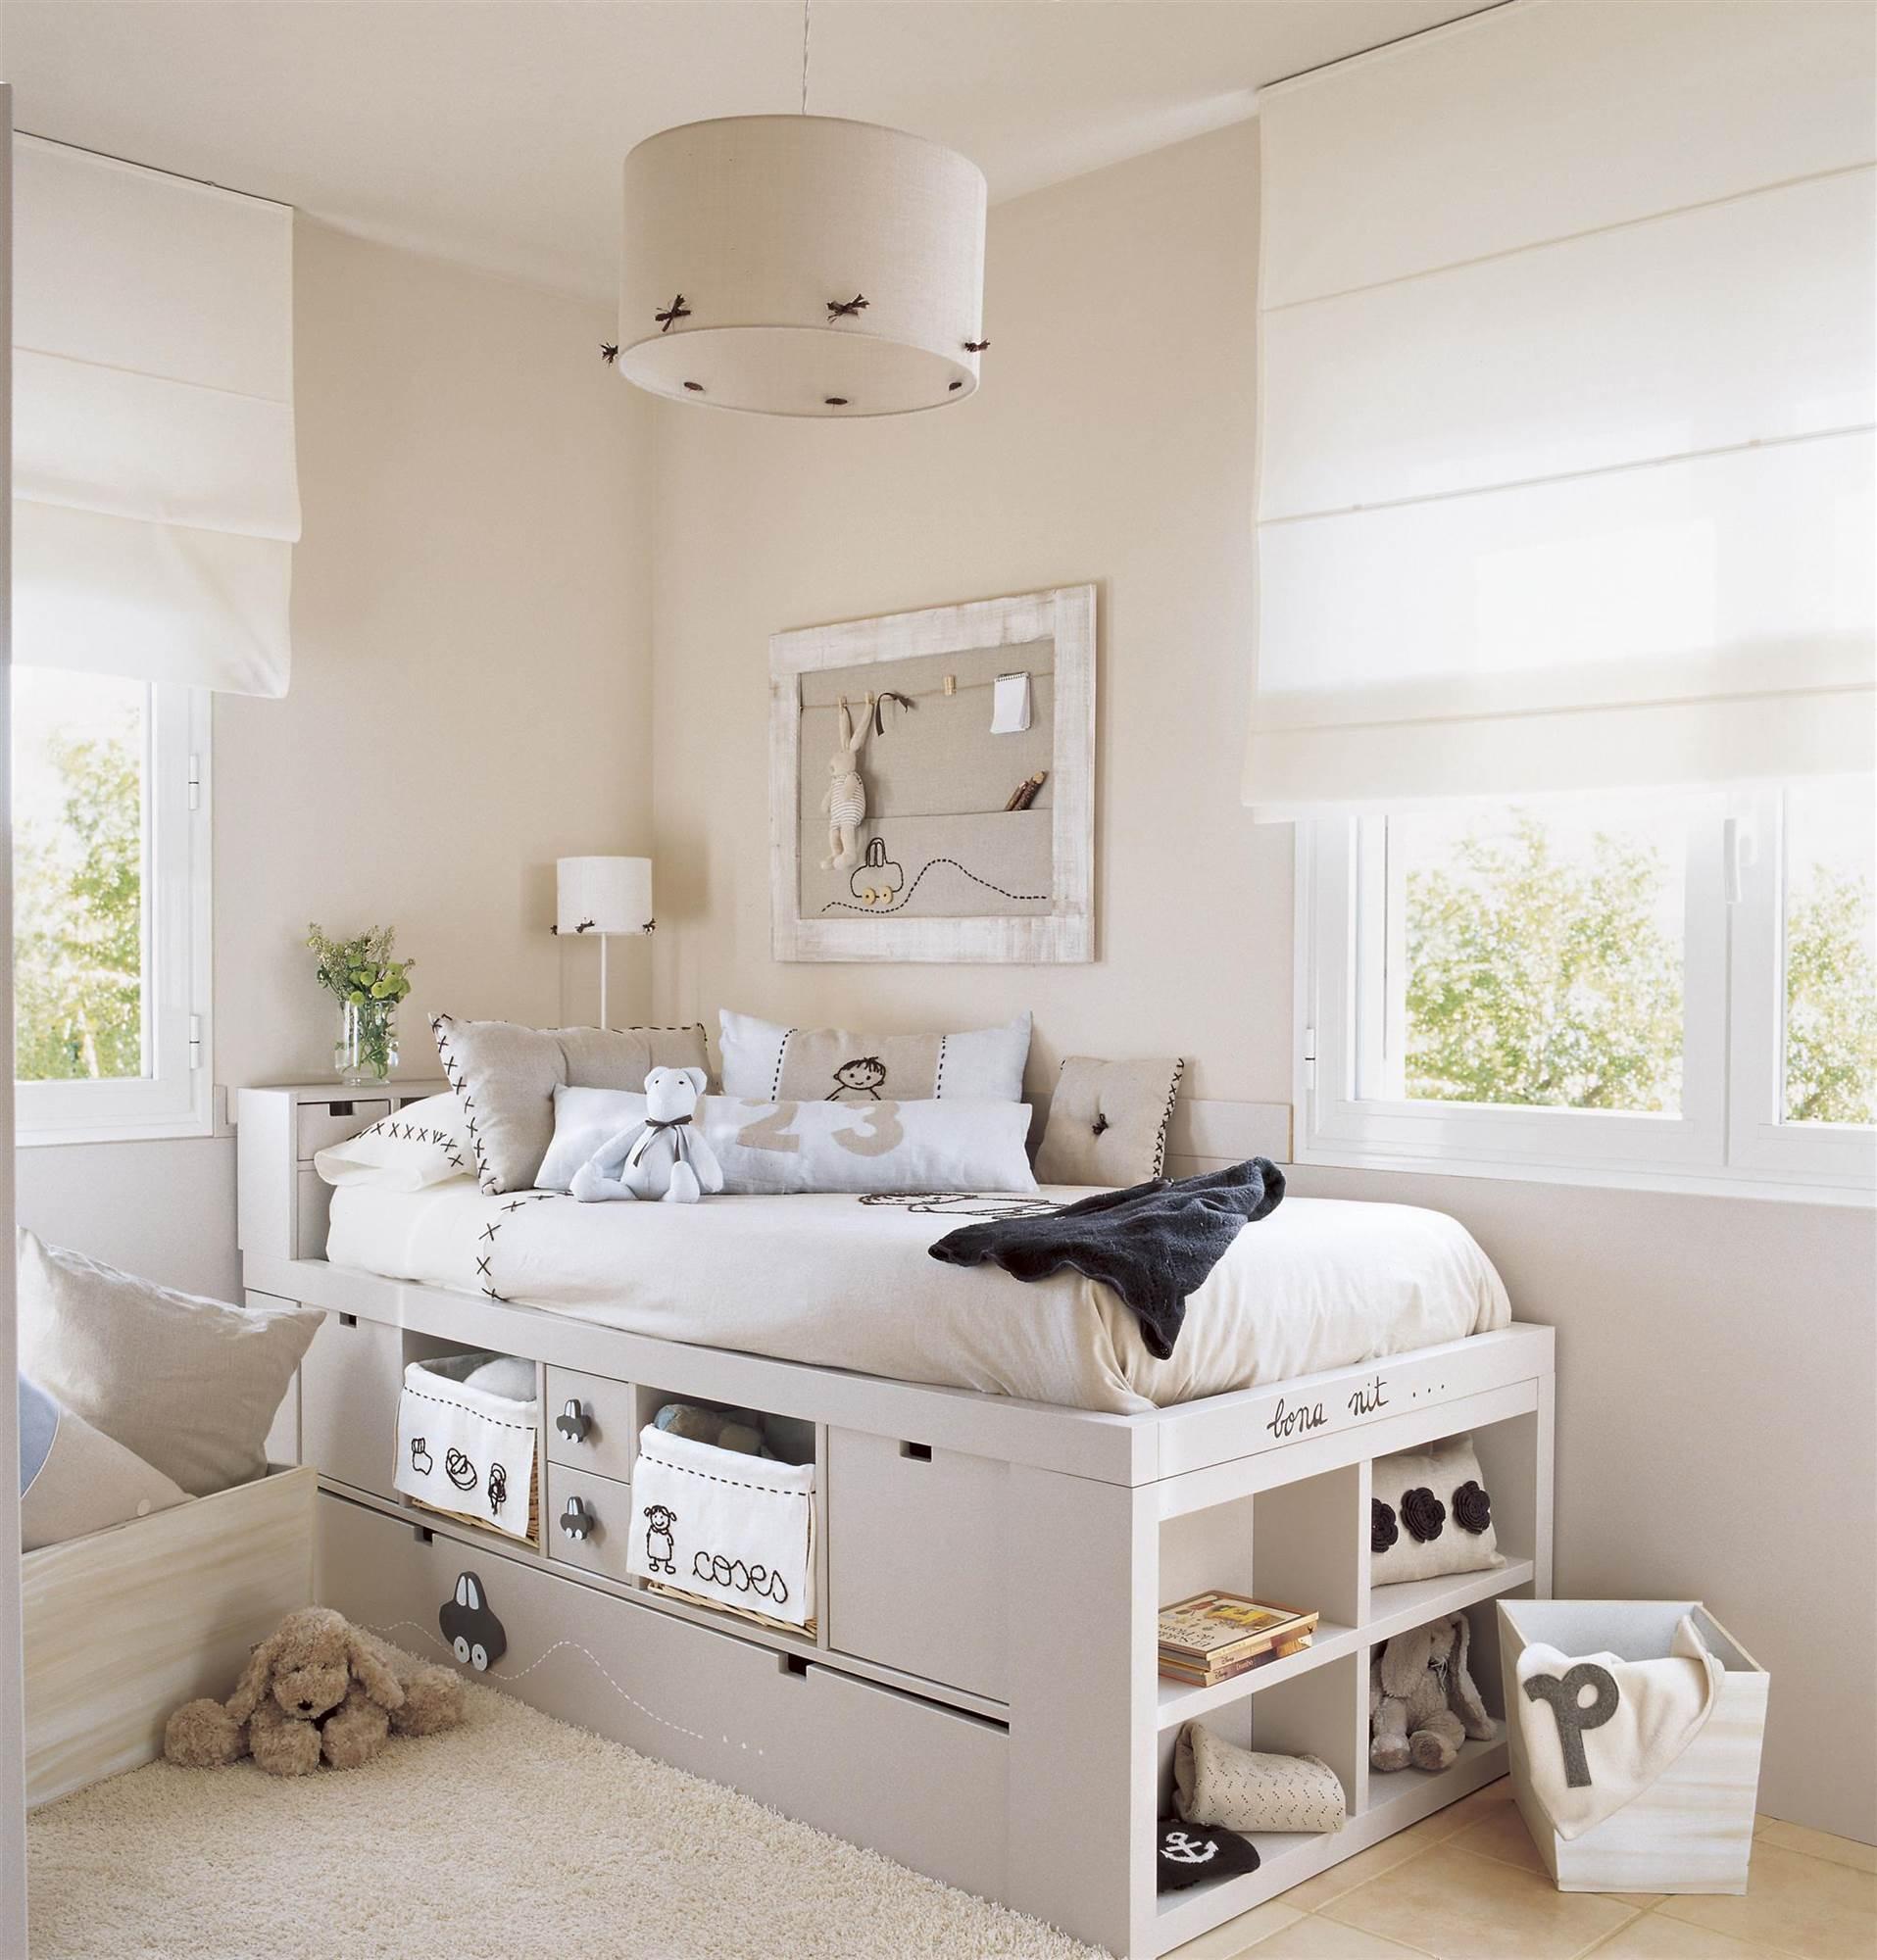 Soluciones para cuartos de ni os peque os for Dormitorios decorados en gris